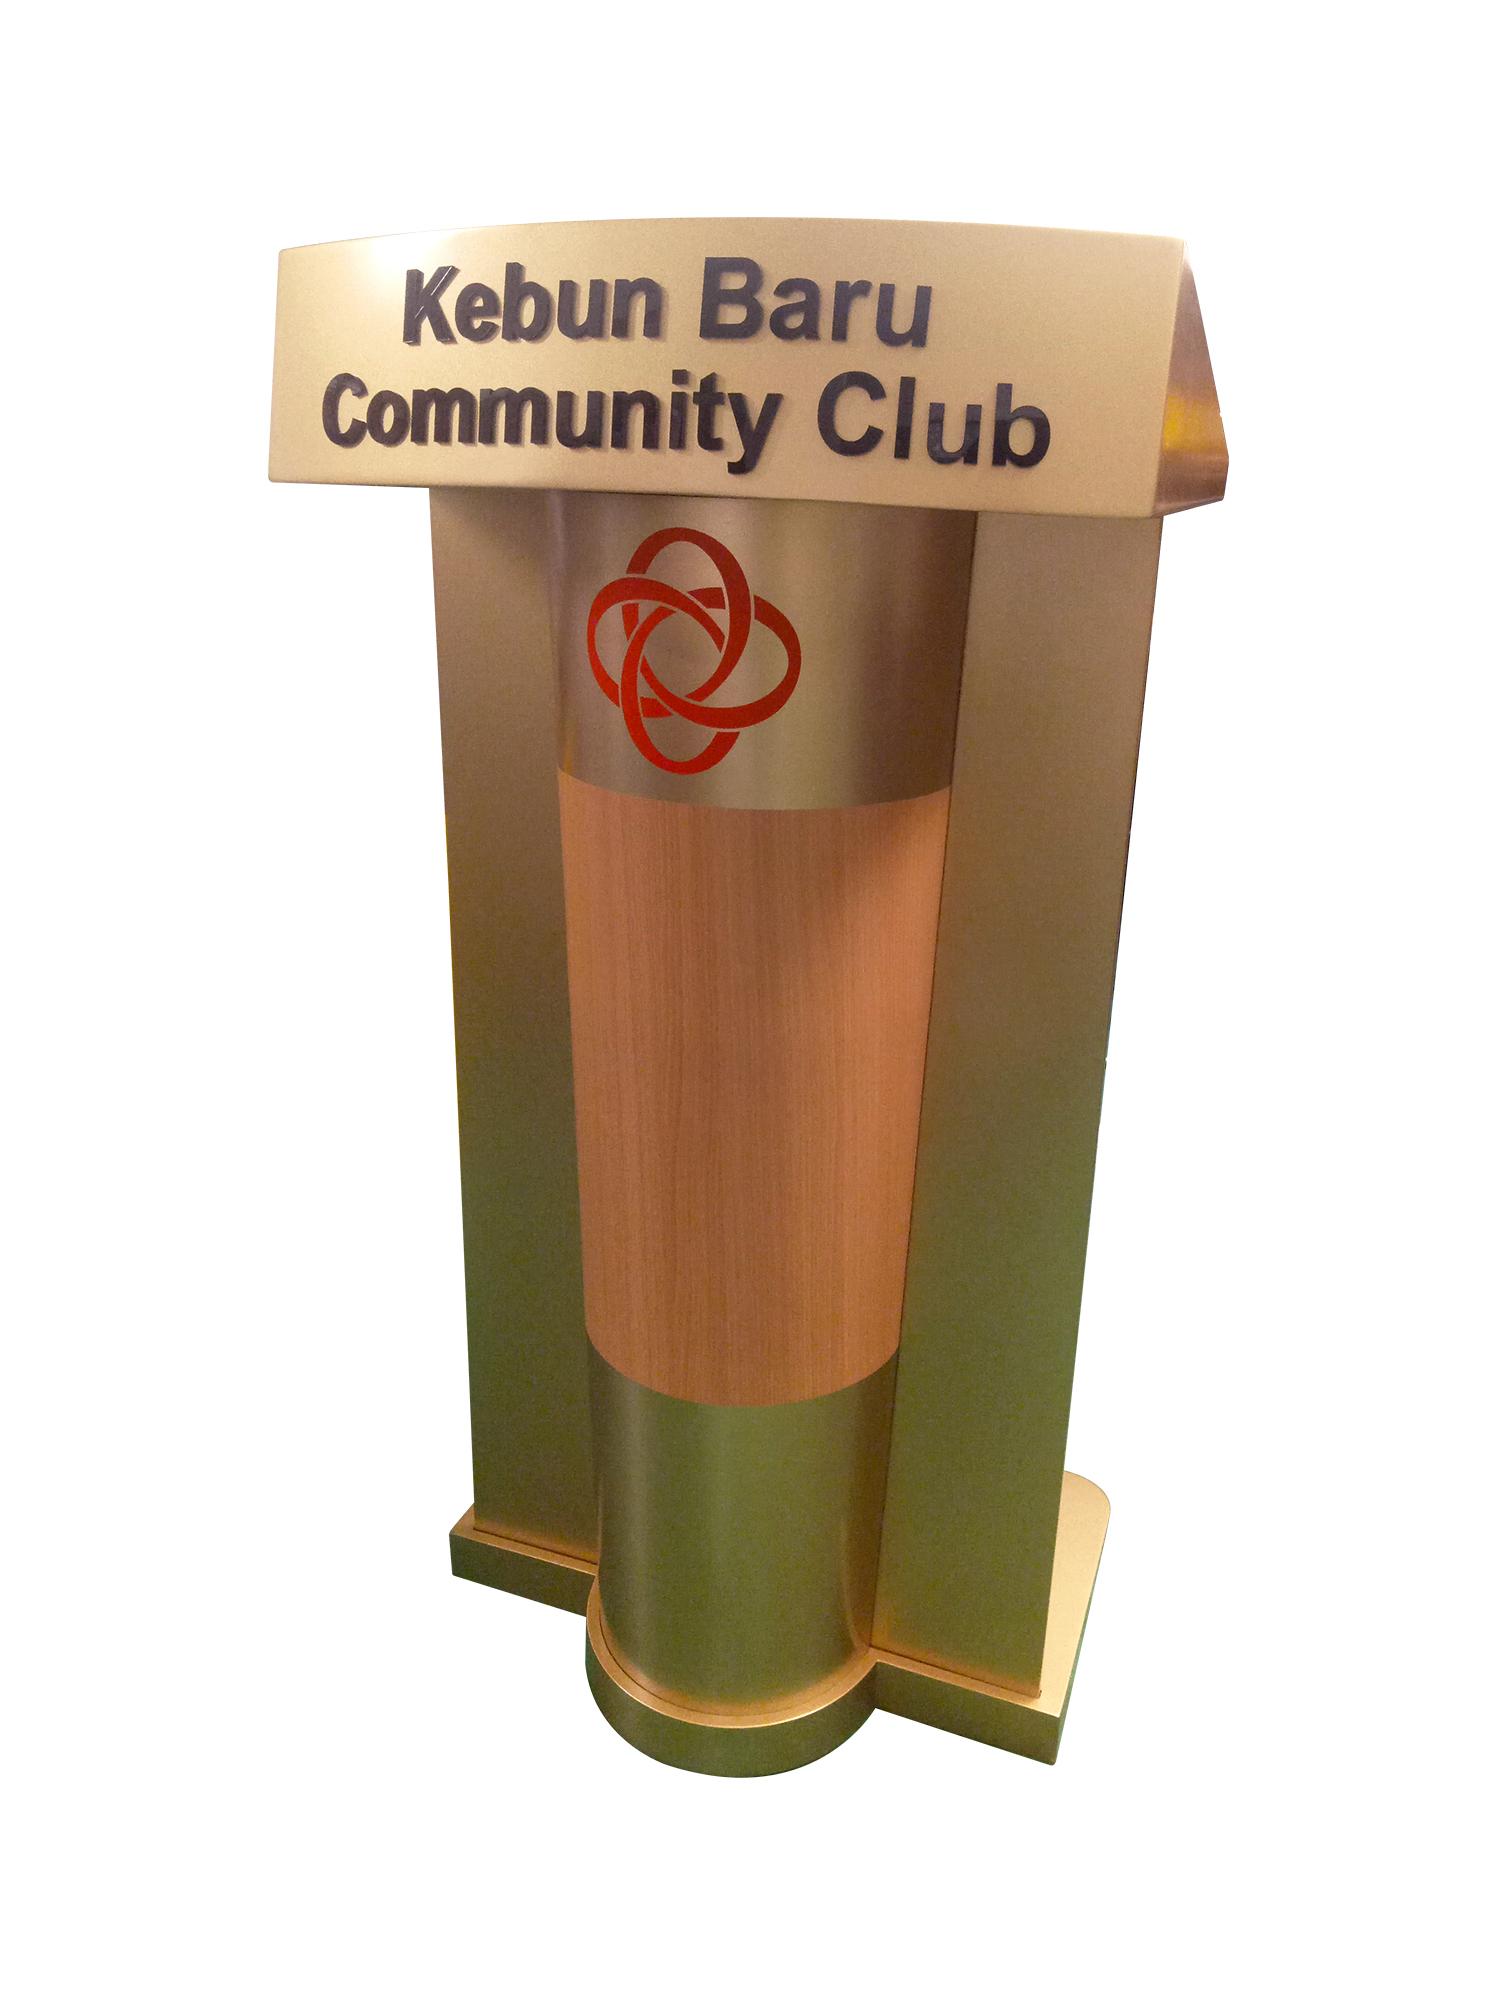 Kebun Baru Community Club